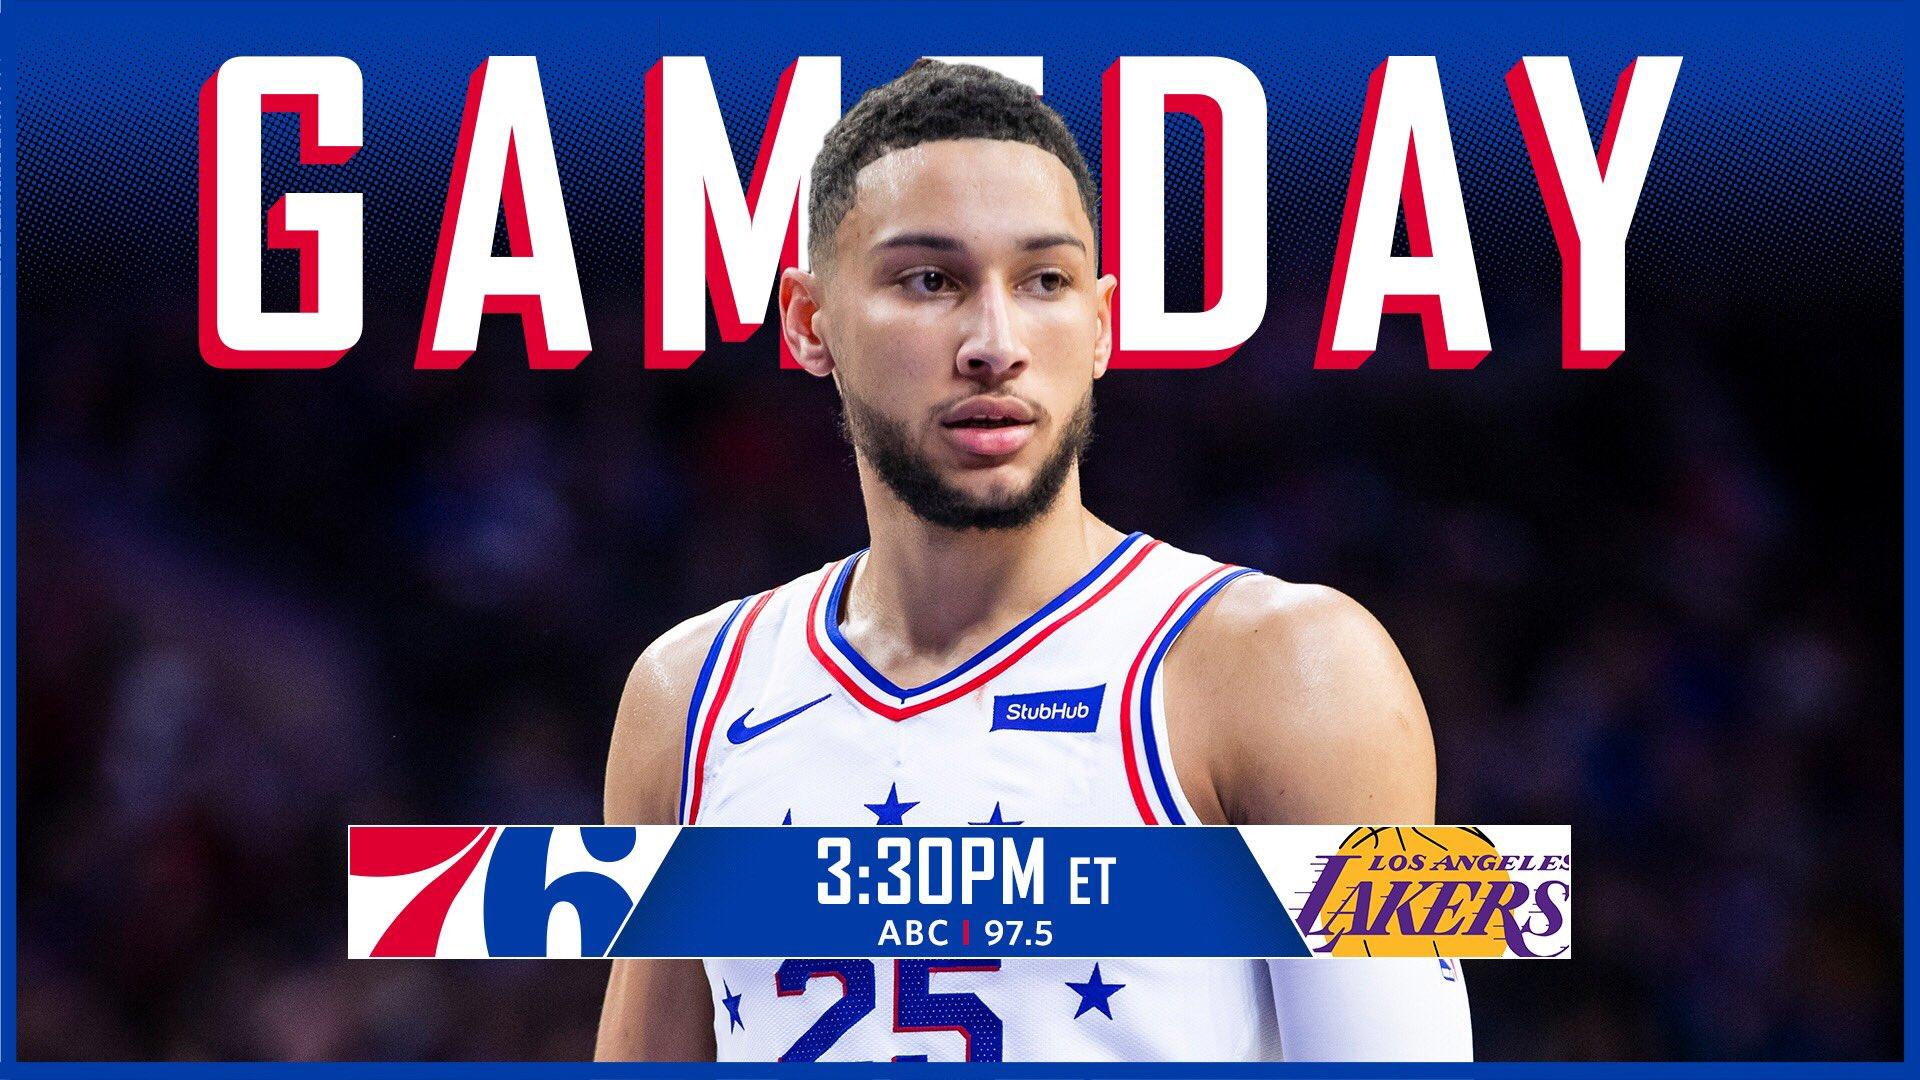 Are you ready for some f̶o̶o̶t̶b̶a̶l̶l̶ basketball?  ��: ABC       ��: @975TheFanatic  ��: https://t.co/XvDA9SGLJ1 https://t.co/X4uxOBoOXq